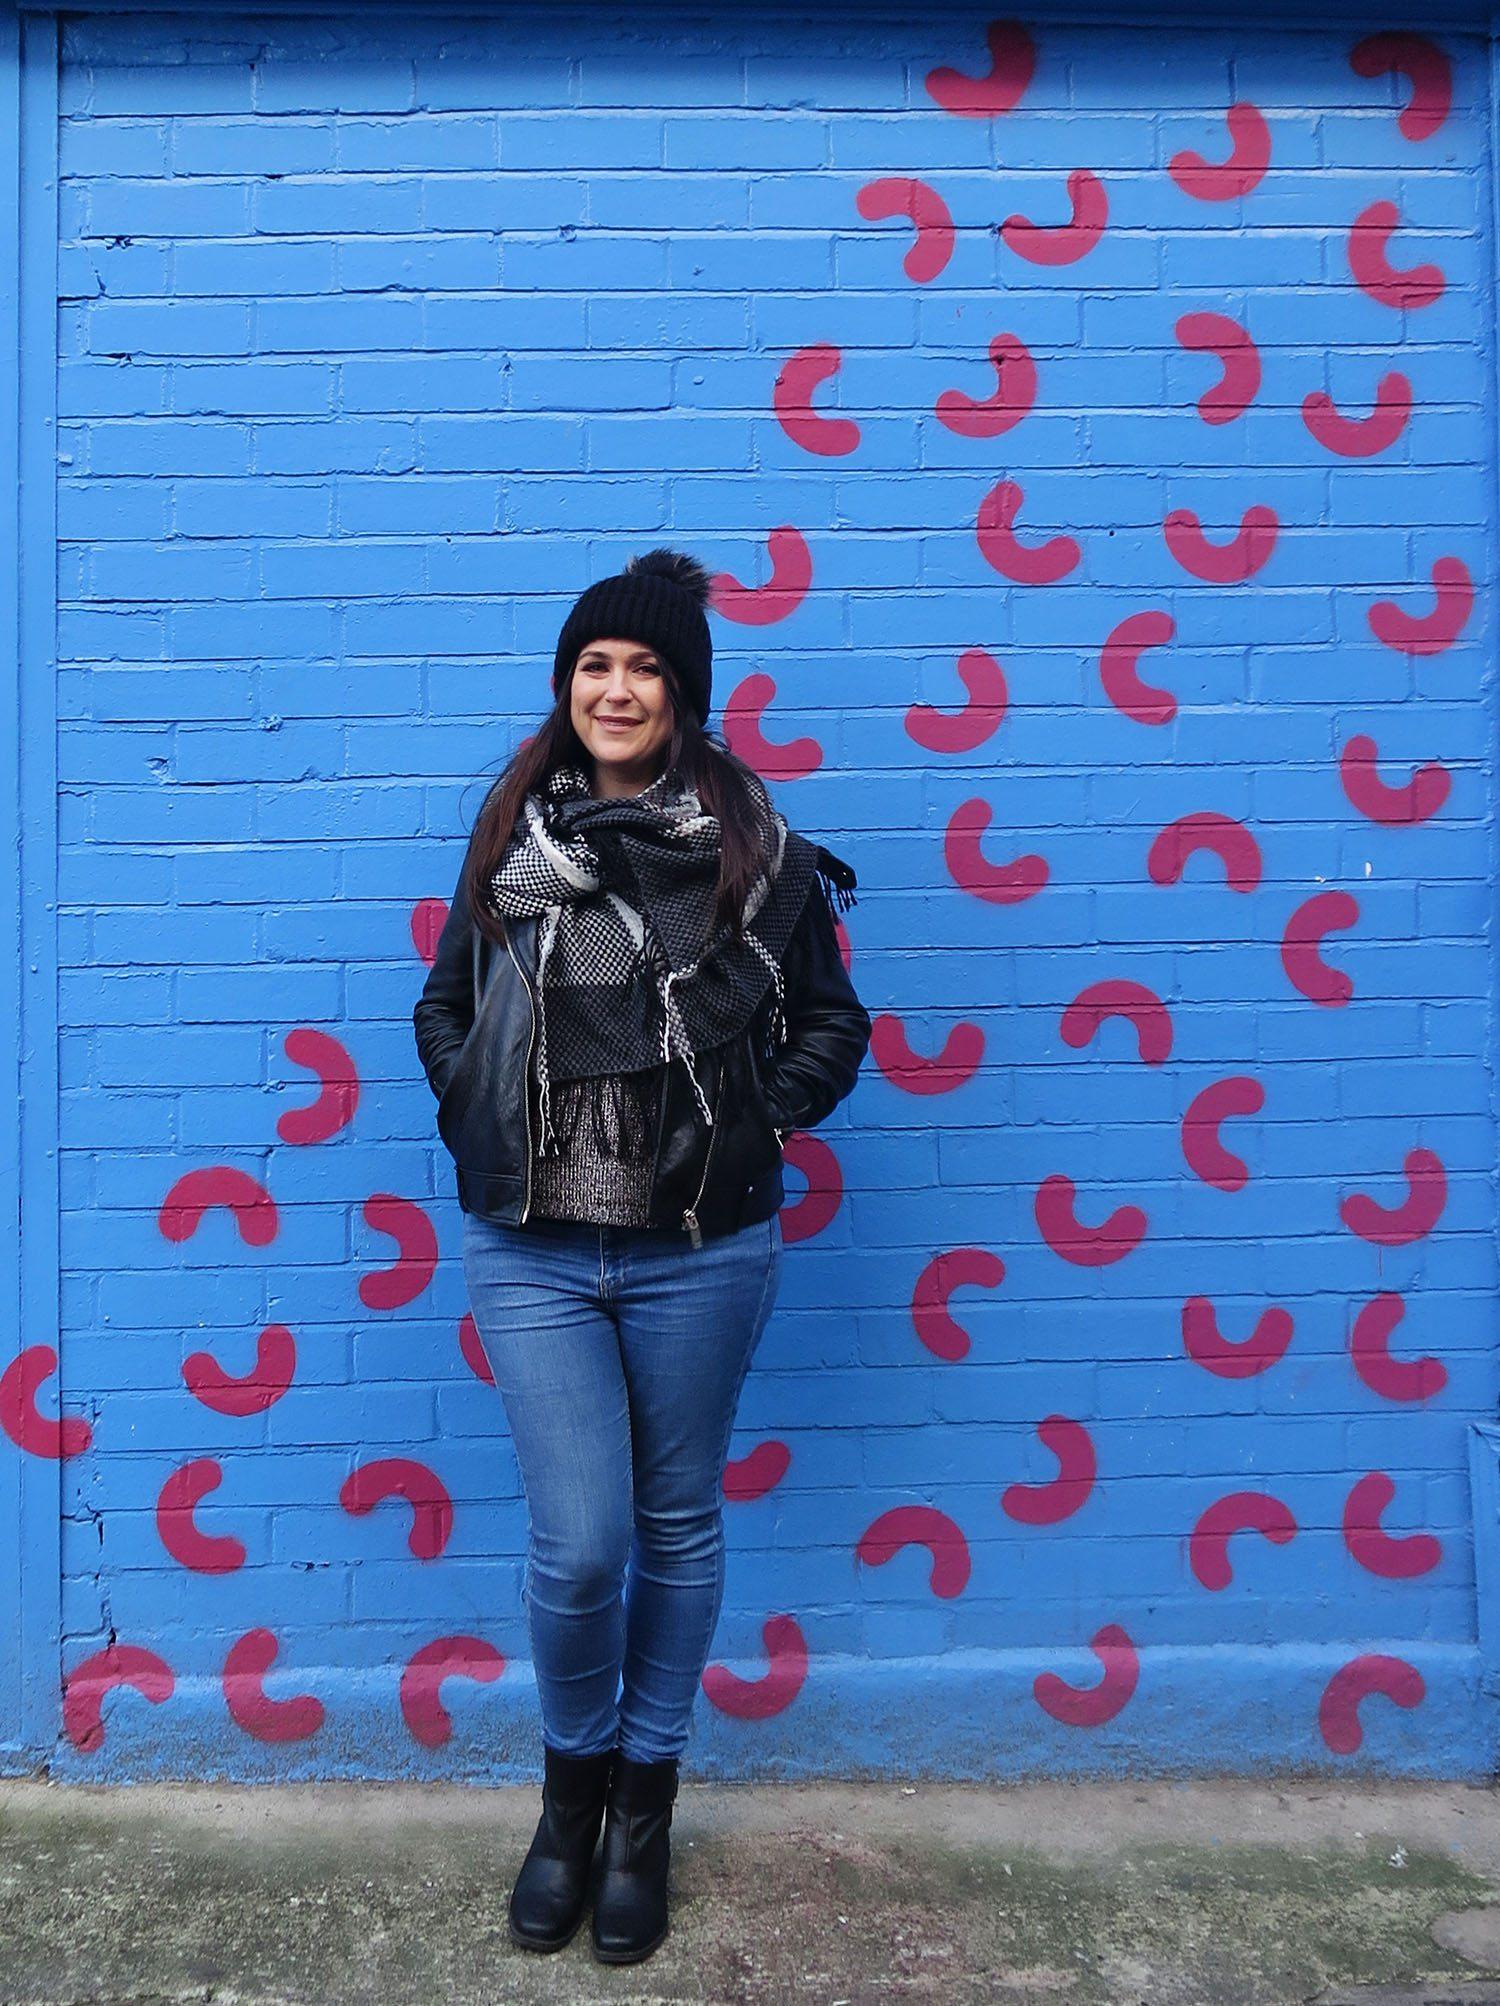 Blue Wall Leeds